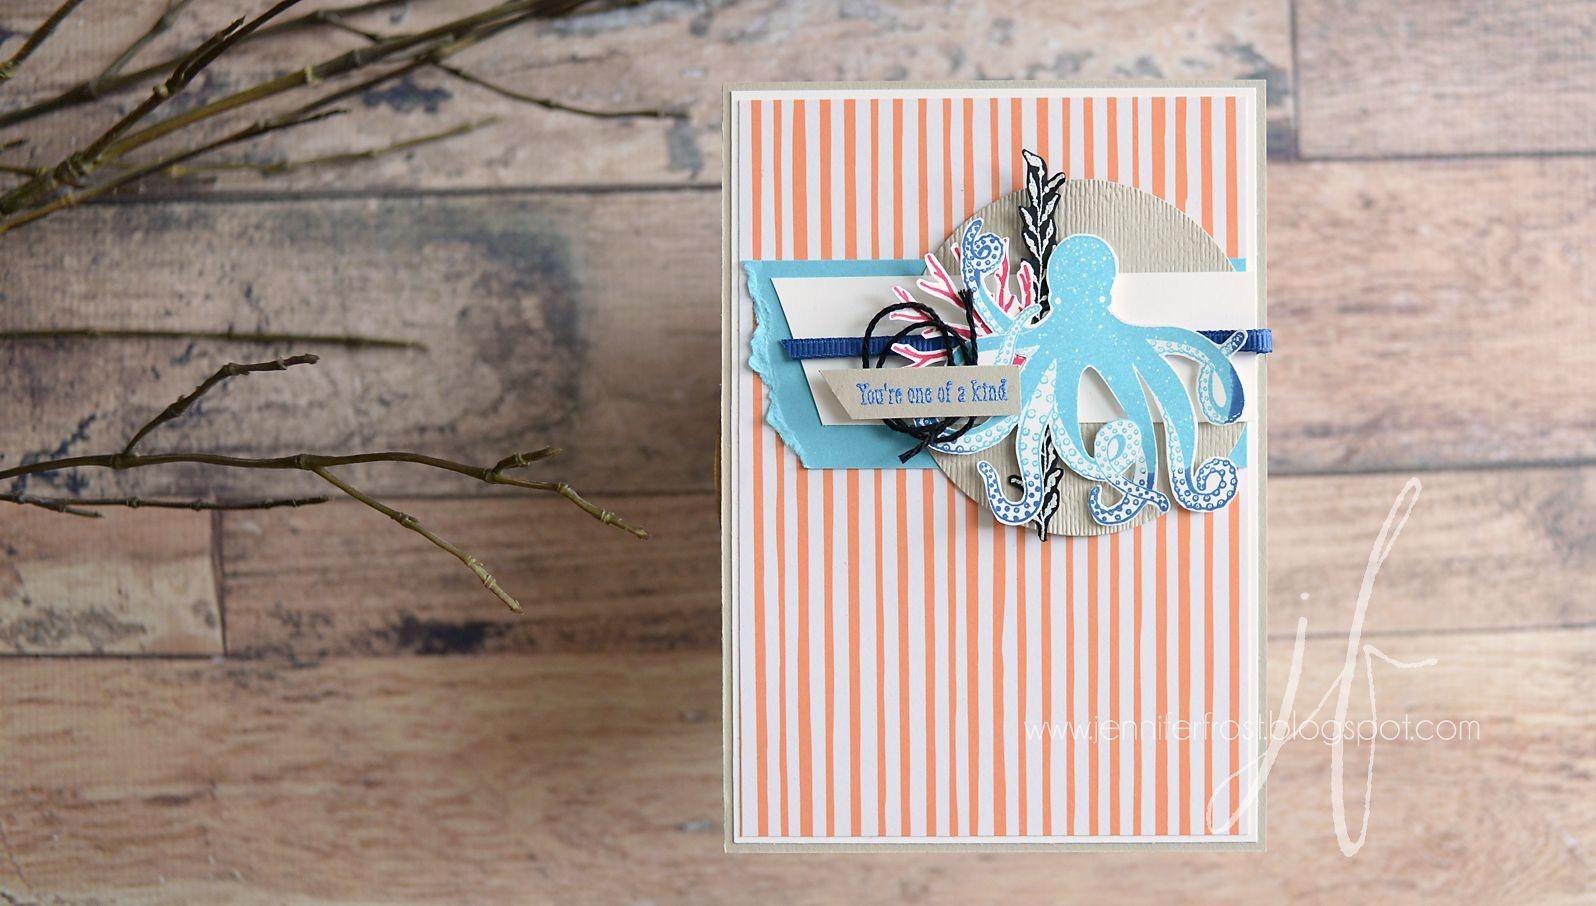 Octopus Papercraft Sea Of Textures Stampin Sneak Peek Blog Hop